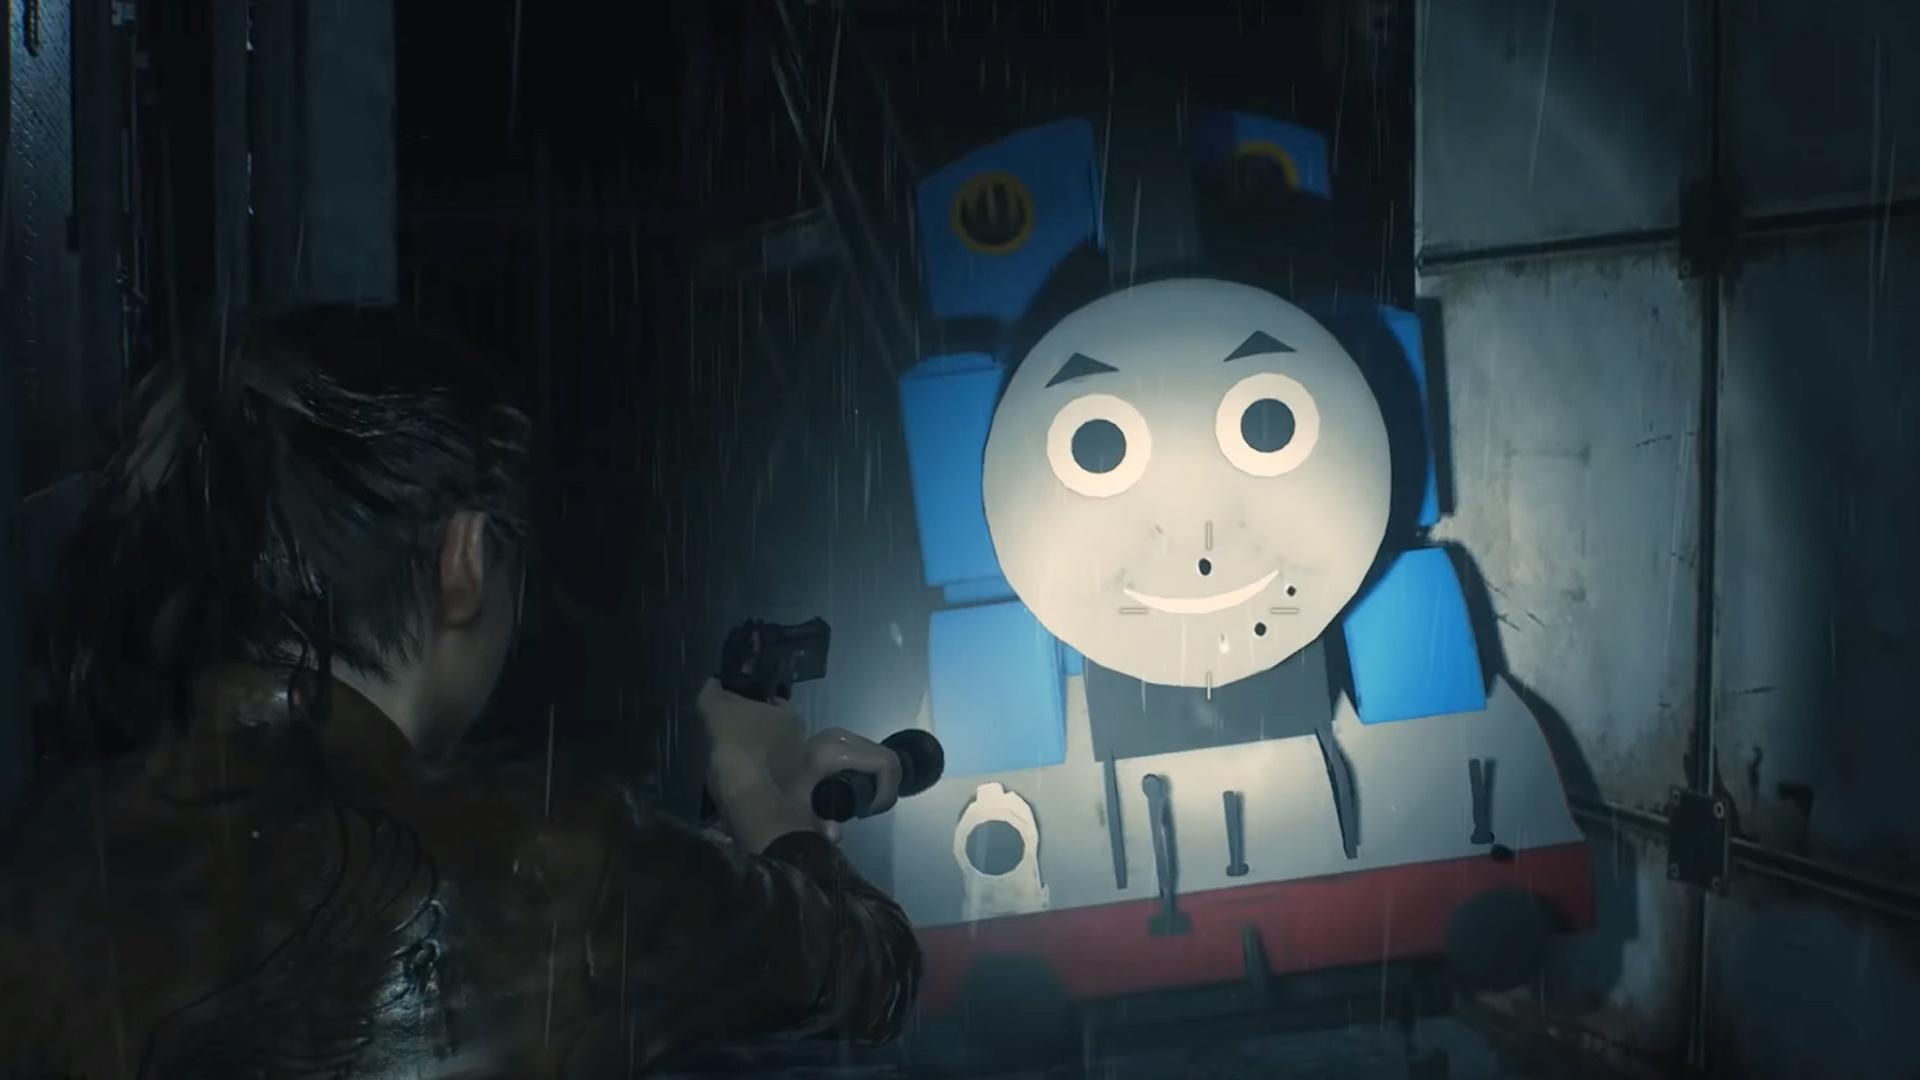 Mod Fur Resident Evil 2 Macht Thomas Die Lokomotive Zum Endgegner